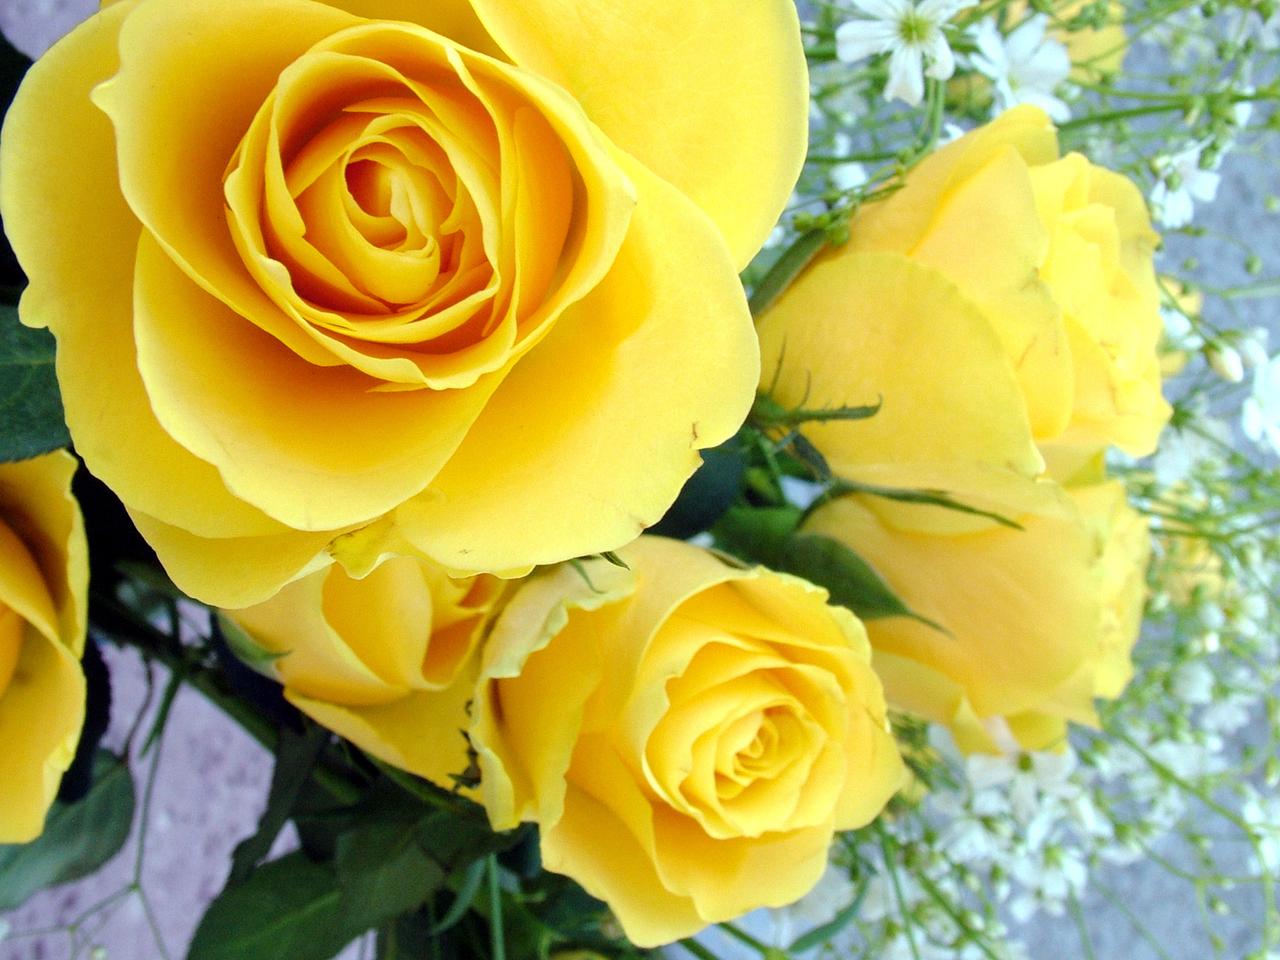 Send joy when you send flowers